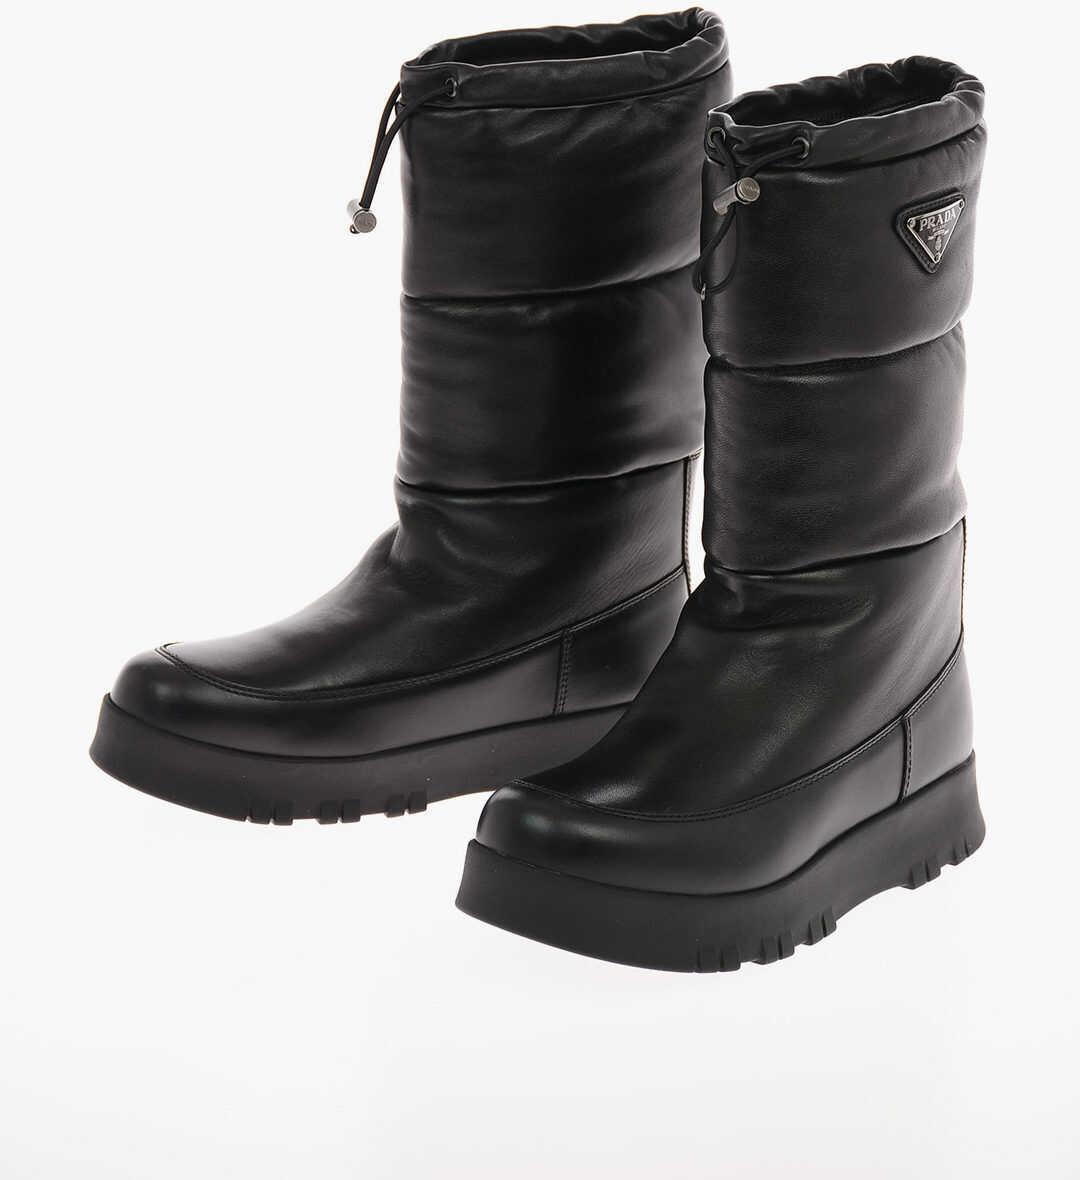 Prada Leather Padded Boots with Drawstring BLACK imagine b-mall.ro